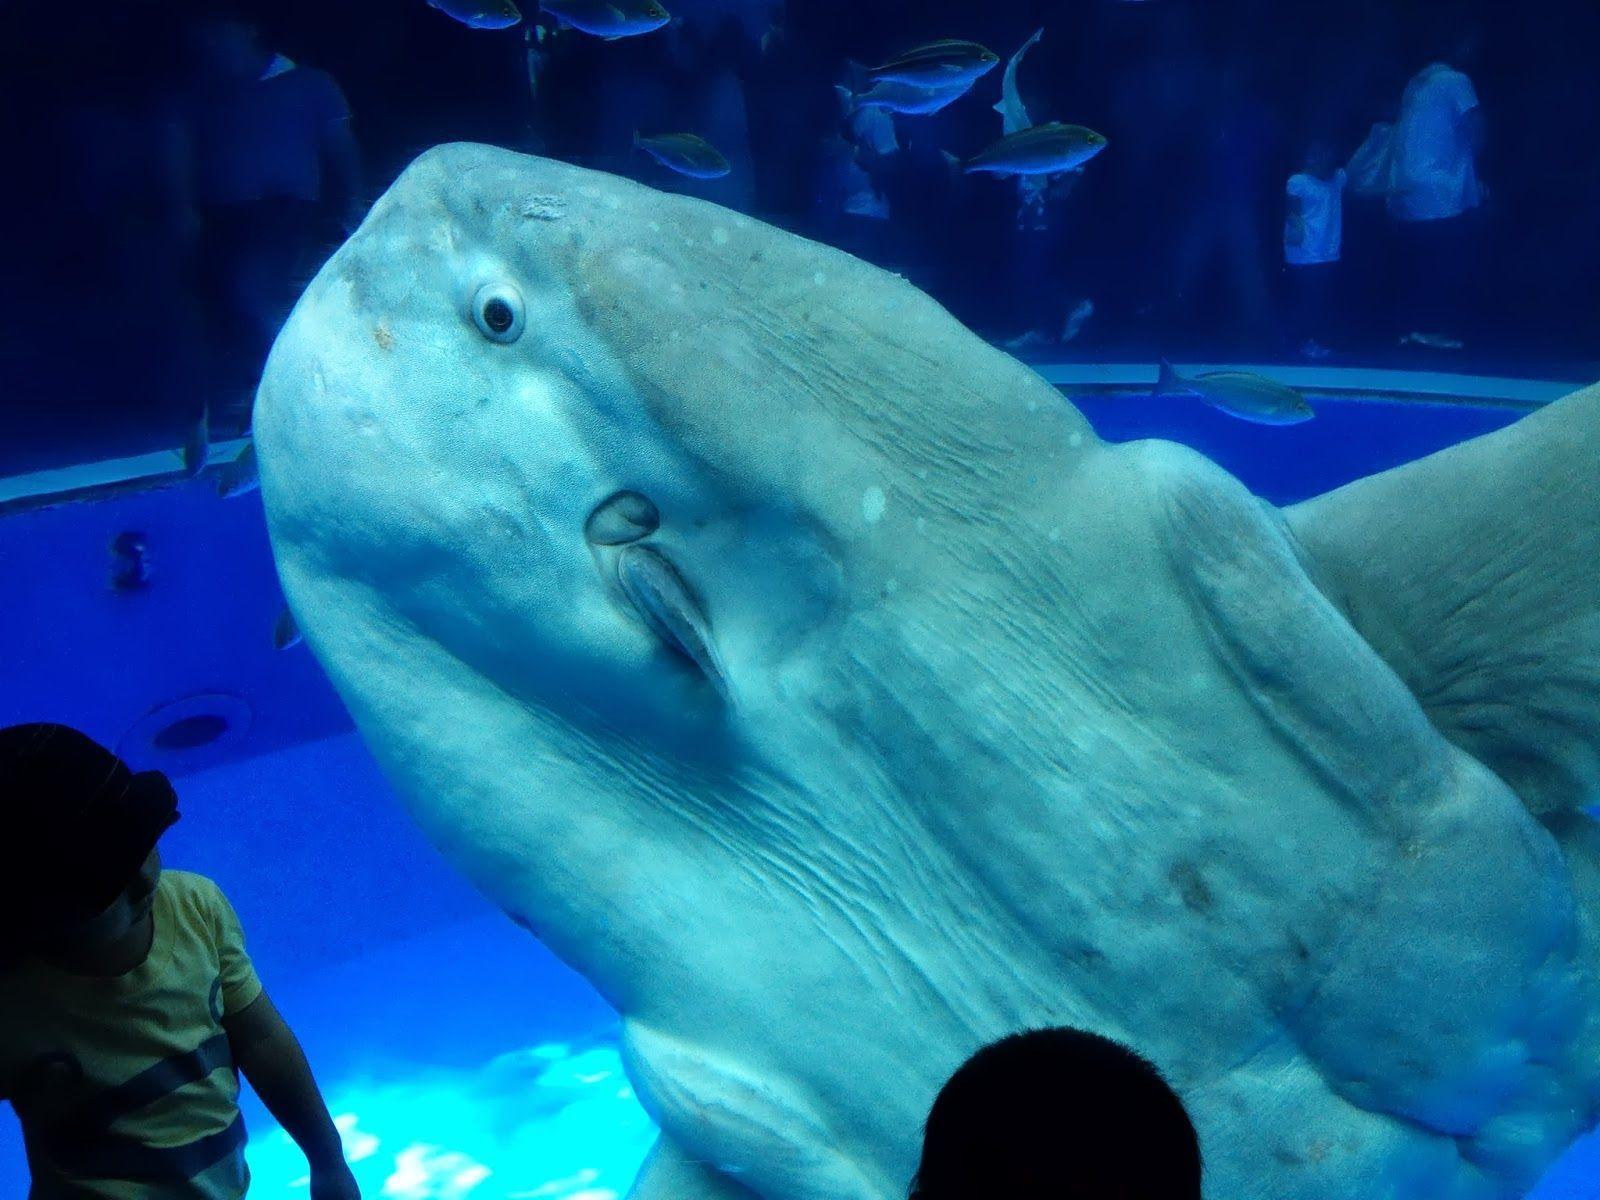 Beluga whales wallpaper - photo#45